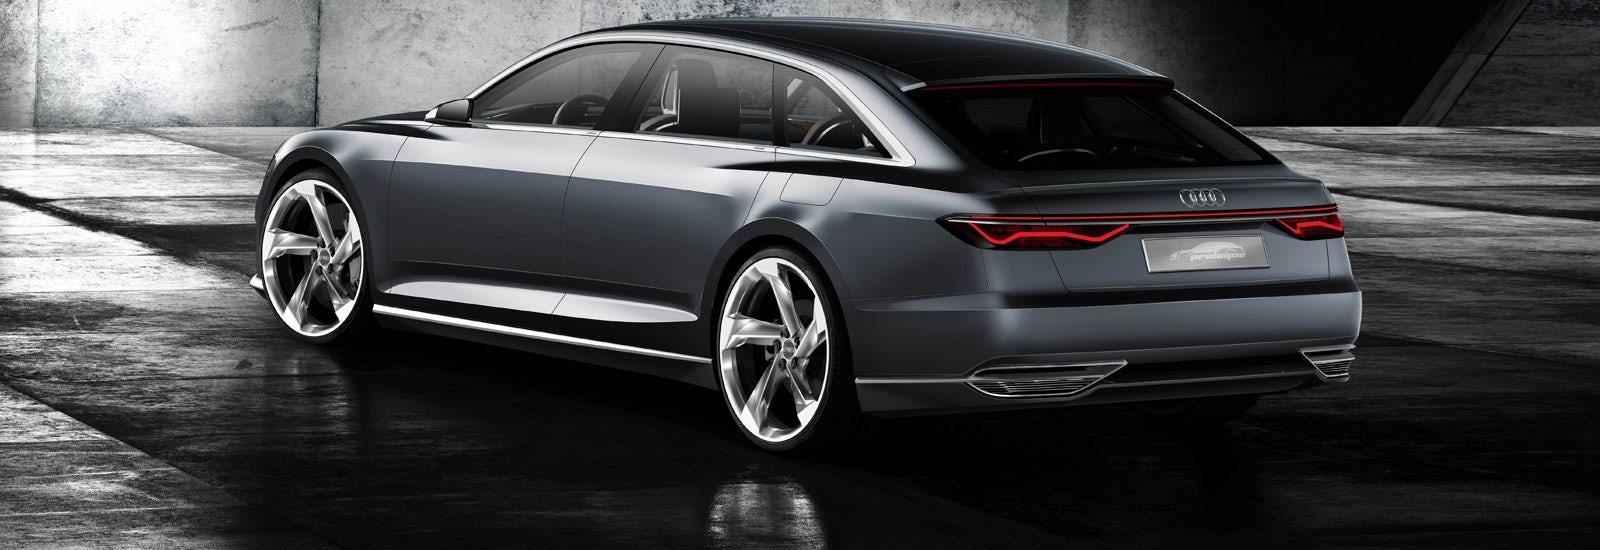 2019 Audi A6 g